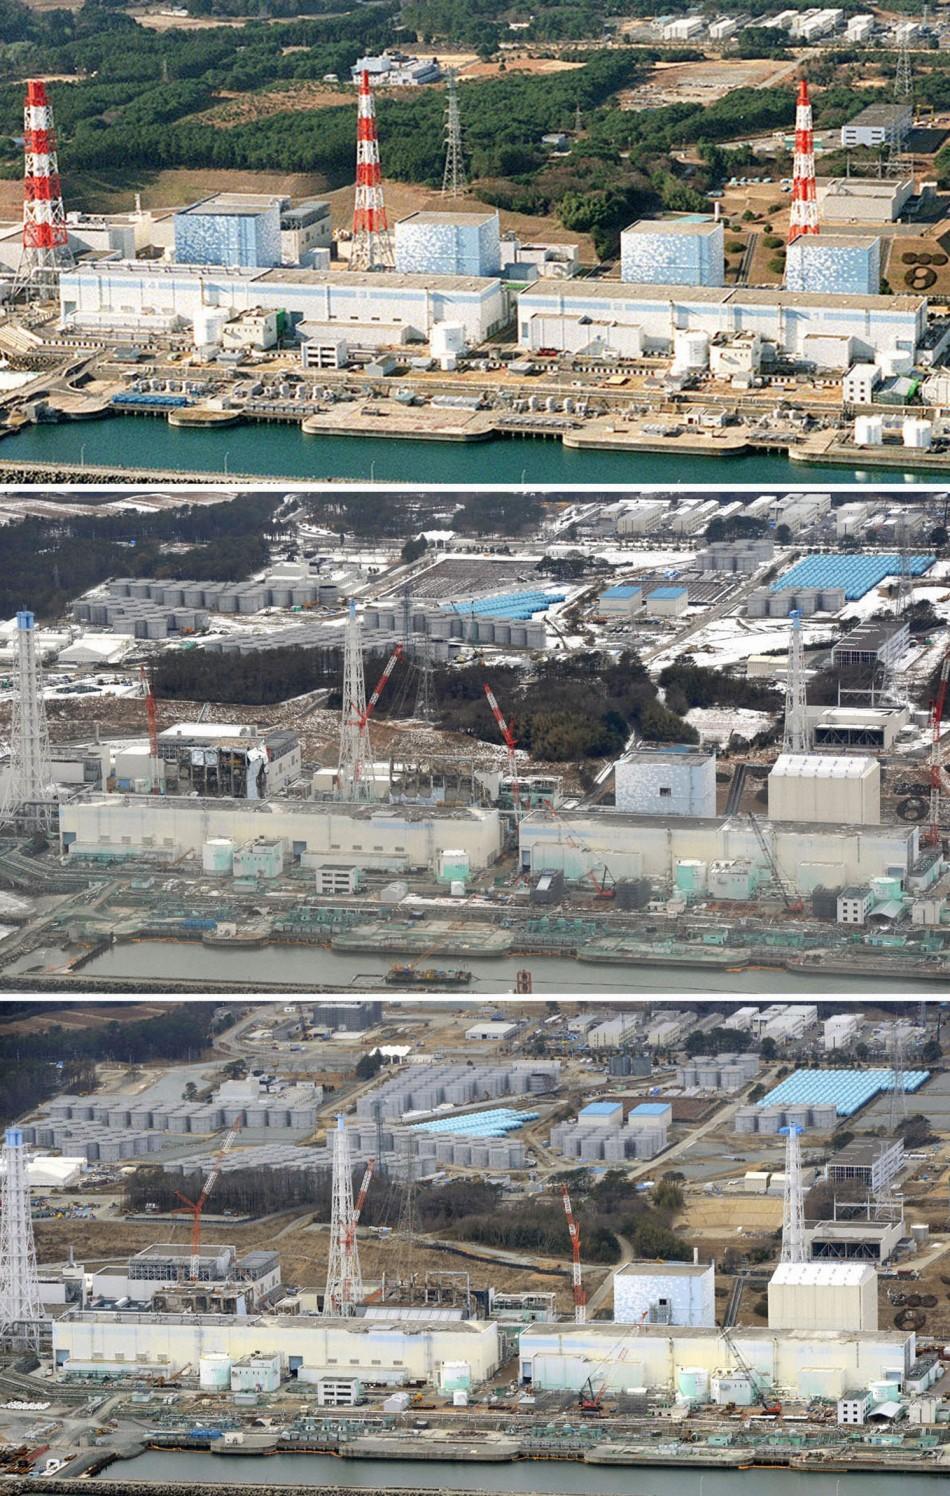 Japan Marks Second Anniversary Of Tōhoku Quake And Tsunami